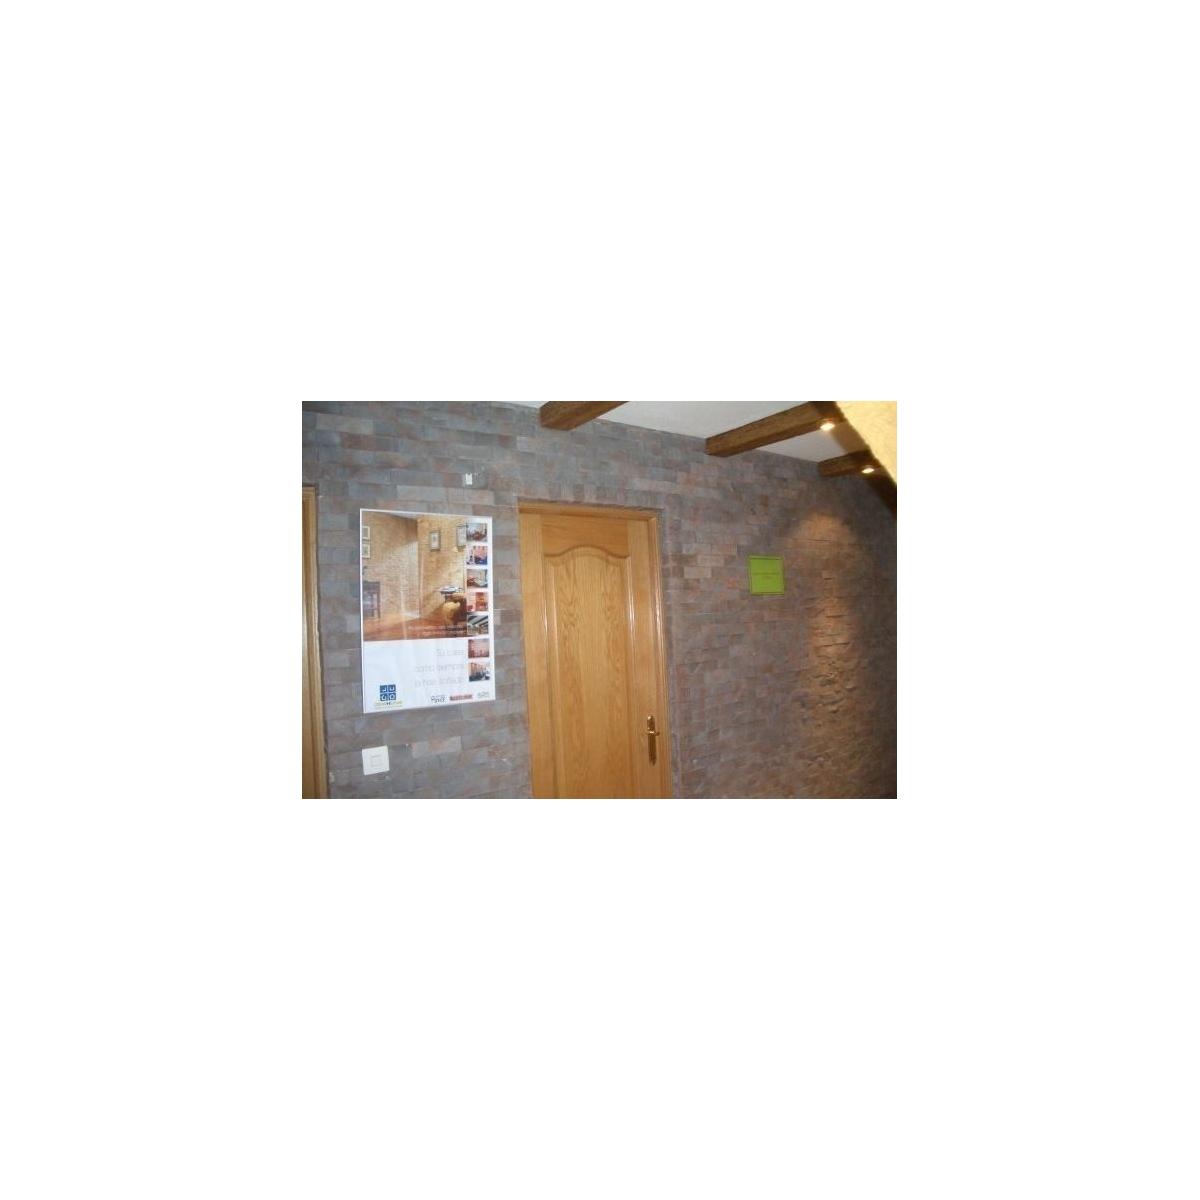 Plaqueta R51 Viena (Caja 1m2) - Revestimiento con Plaquetas de yeso - Marca Revesti-Mur